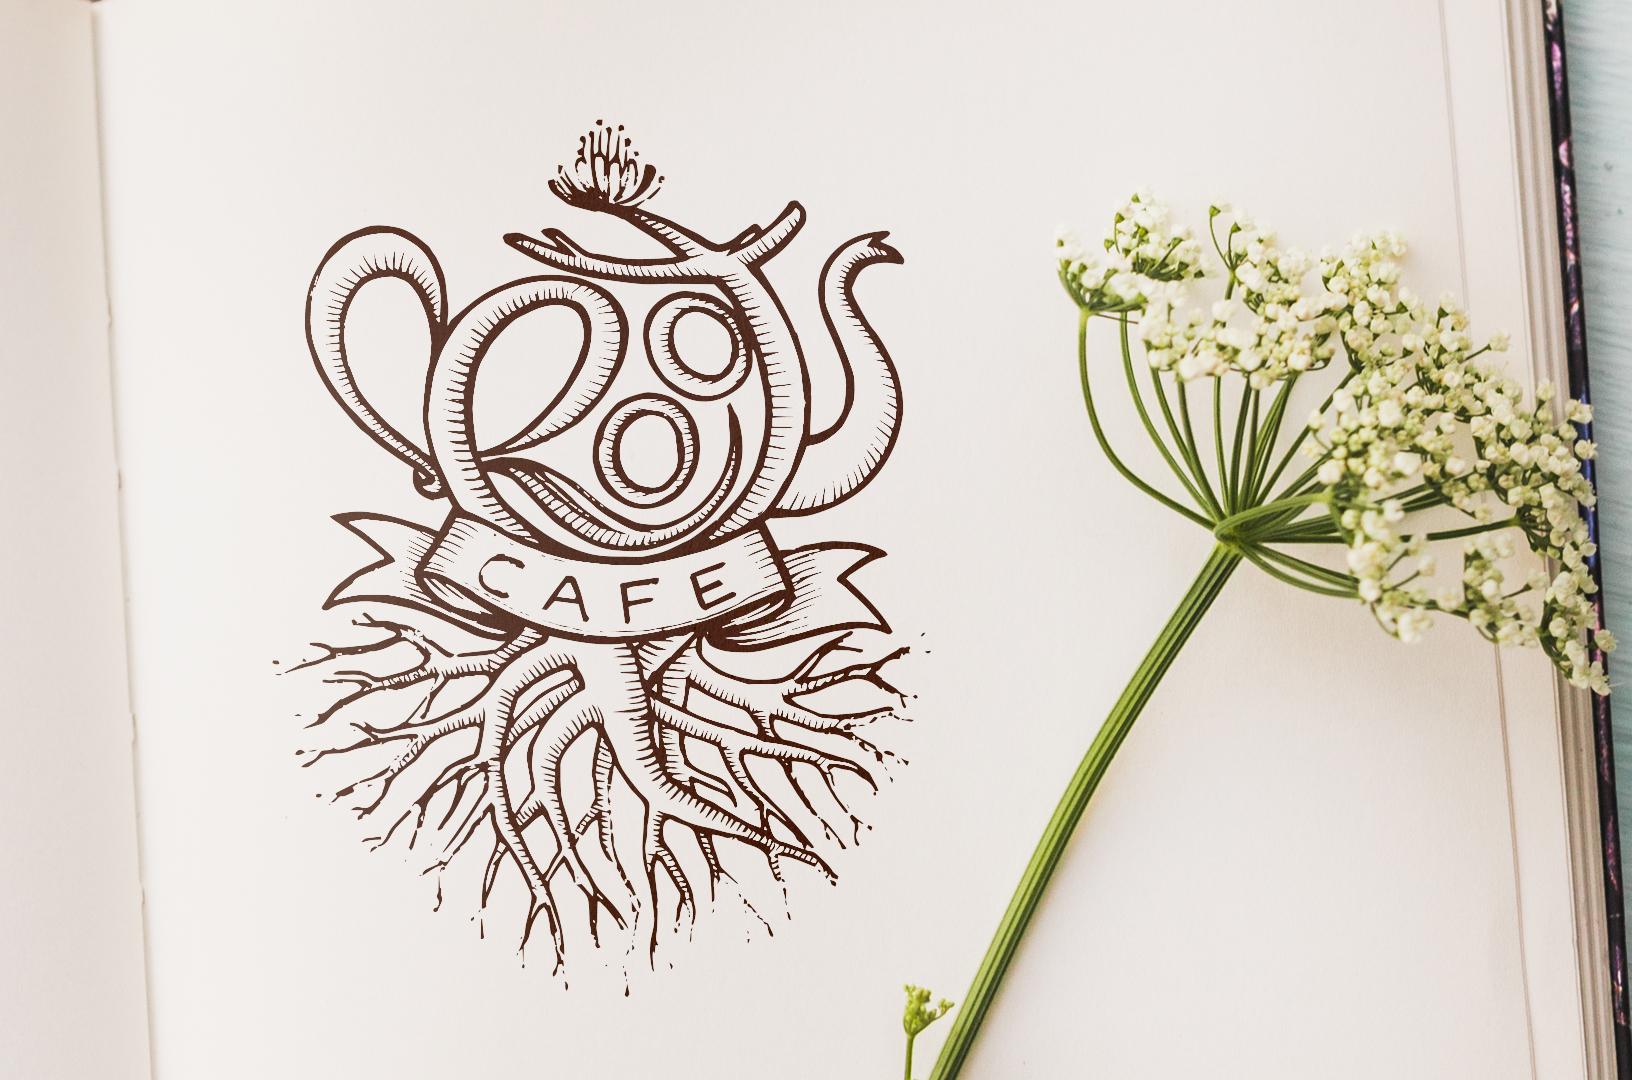 Roots Café Logo - Eleonora Casetta